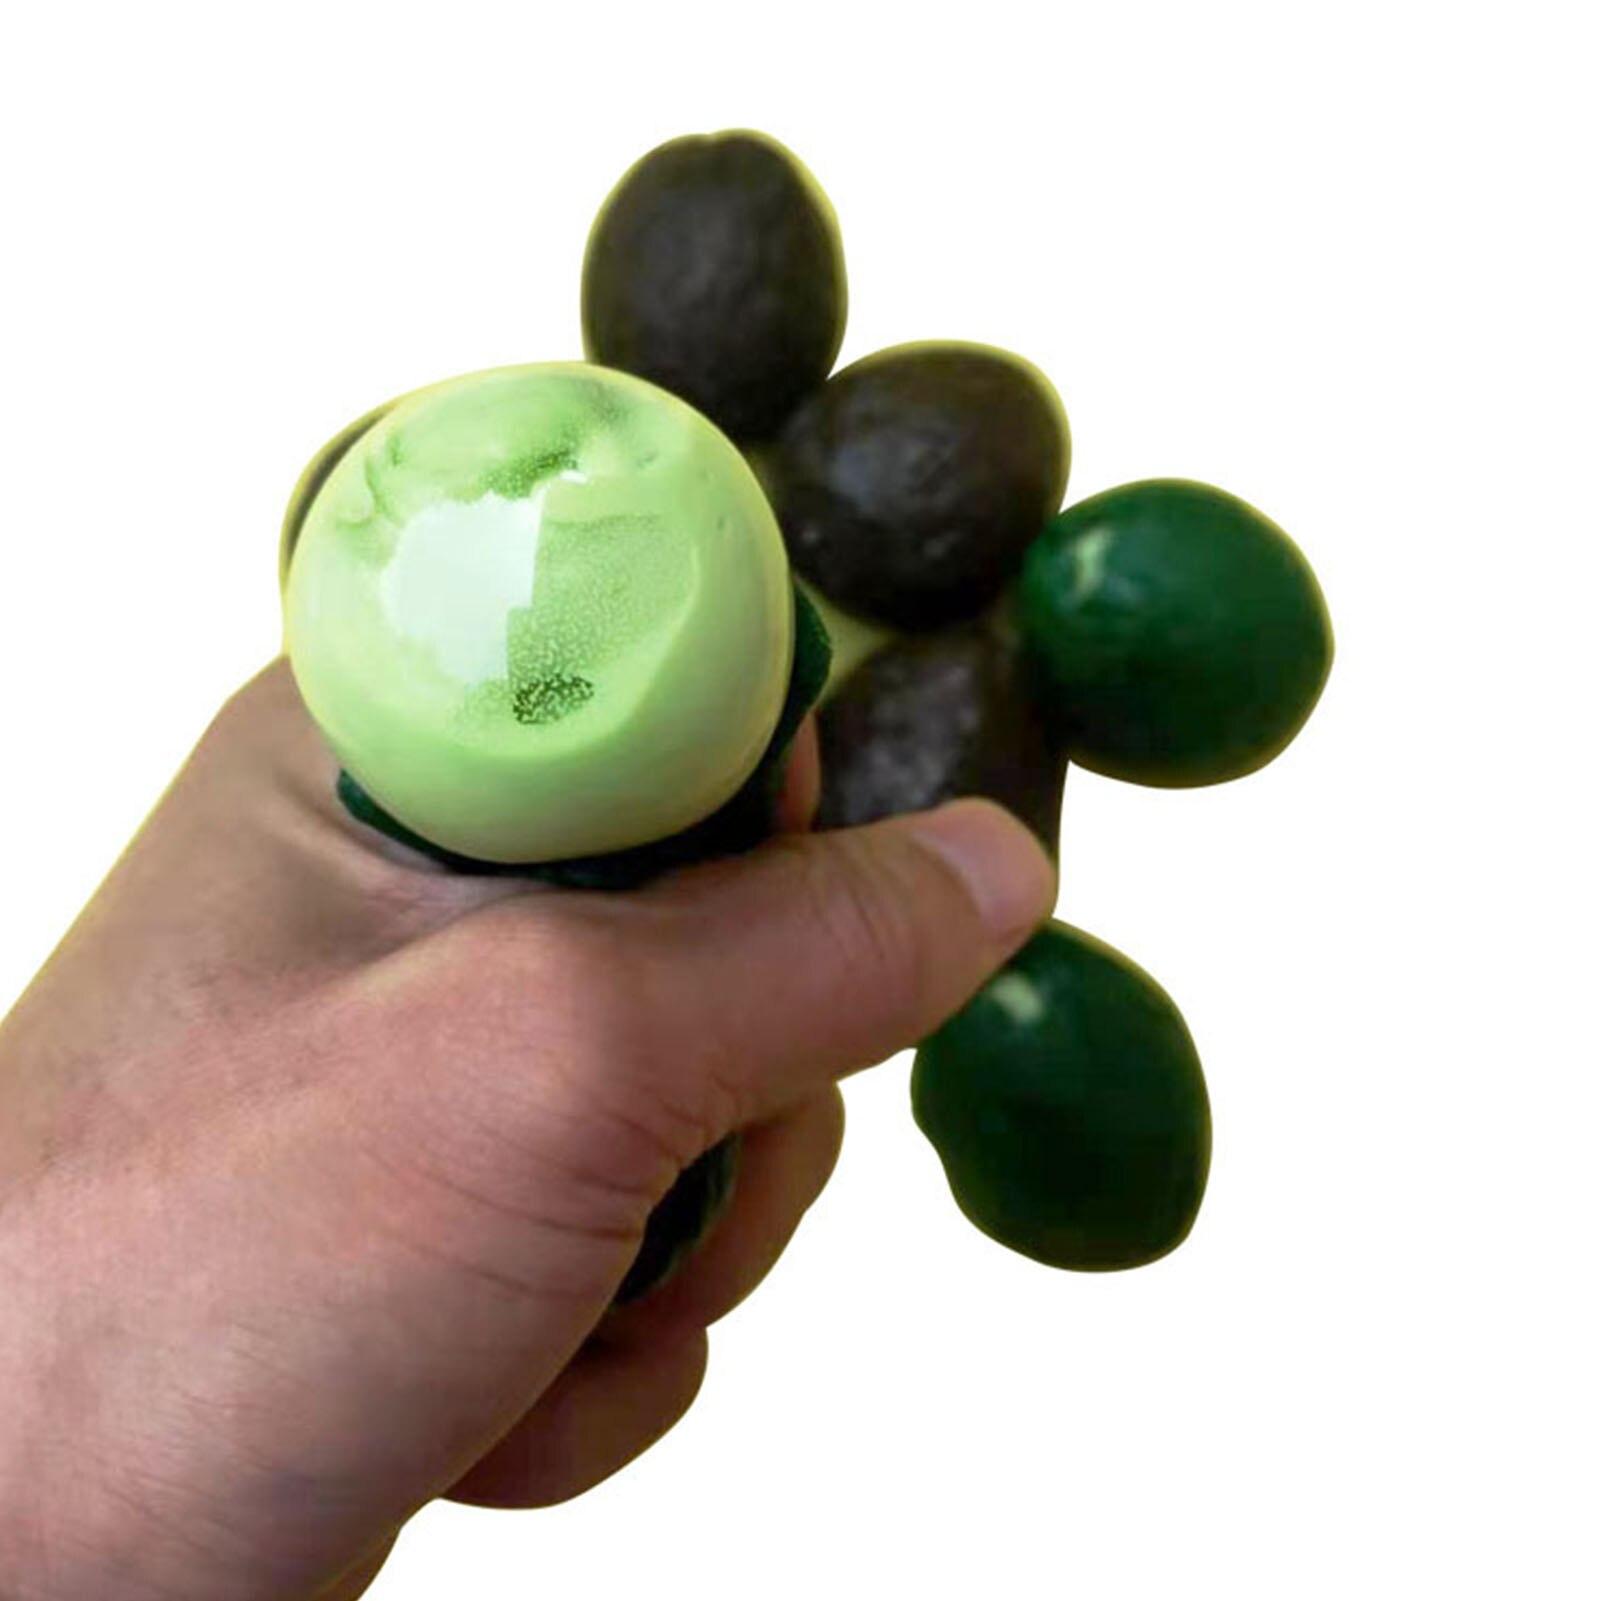 Decompression Pinch Music TPRStrange New Toy Pinch Music Tpr Avocado Decompression Vent Flour Ball Stress Relief Decoration enlarge